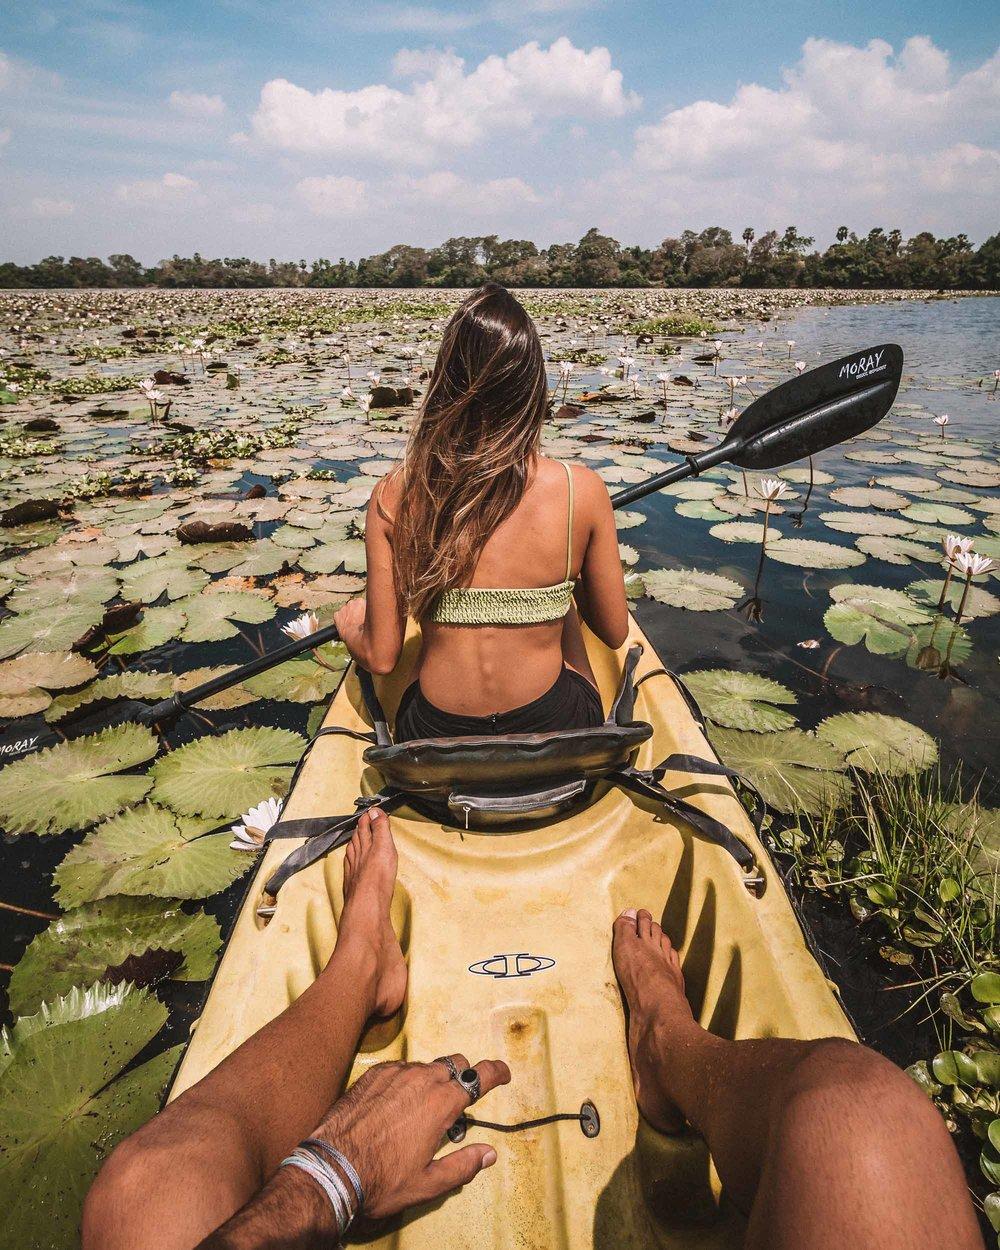 Anuradhapura ulagalla by uga escapes heritage culture Sri Lanka lake kayak ride water lilies